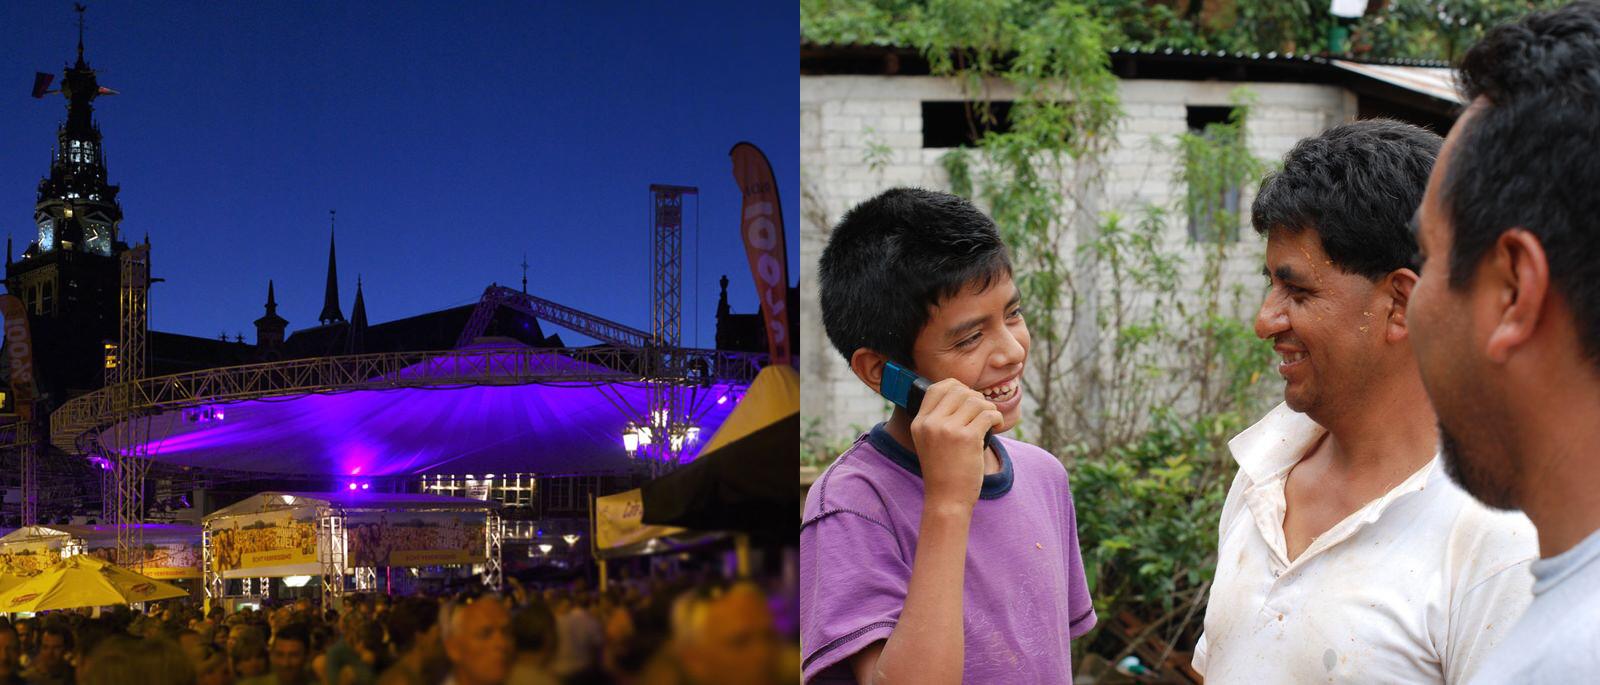 Private network covering the city of Nijmegen, Netherlands / a villager makes a call in Santa Maria Yaviche, Mexico